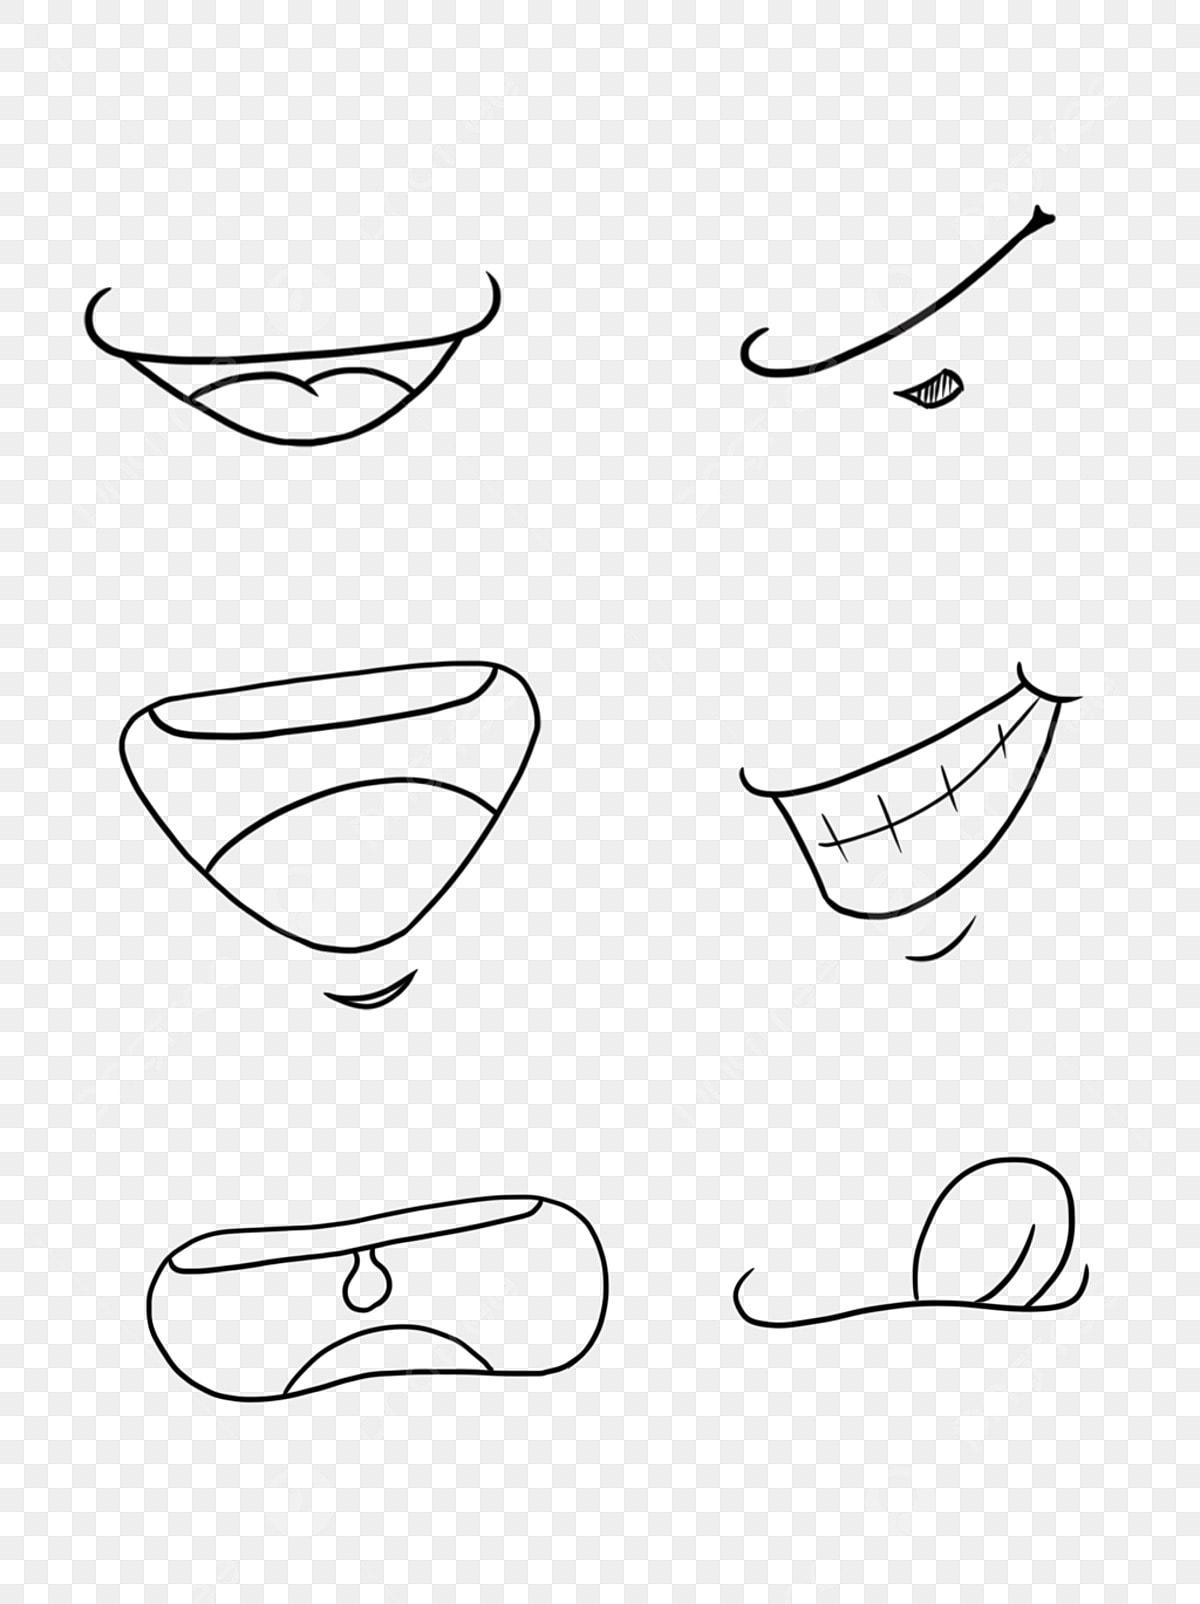 Tangan Kartun Tangan Ditarik Tersenyum Mulut Sketsa